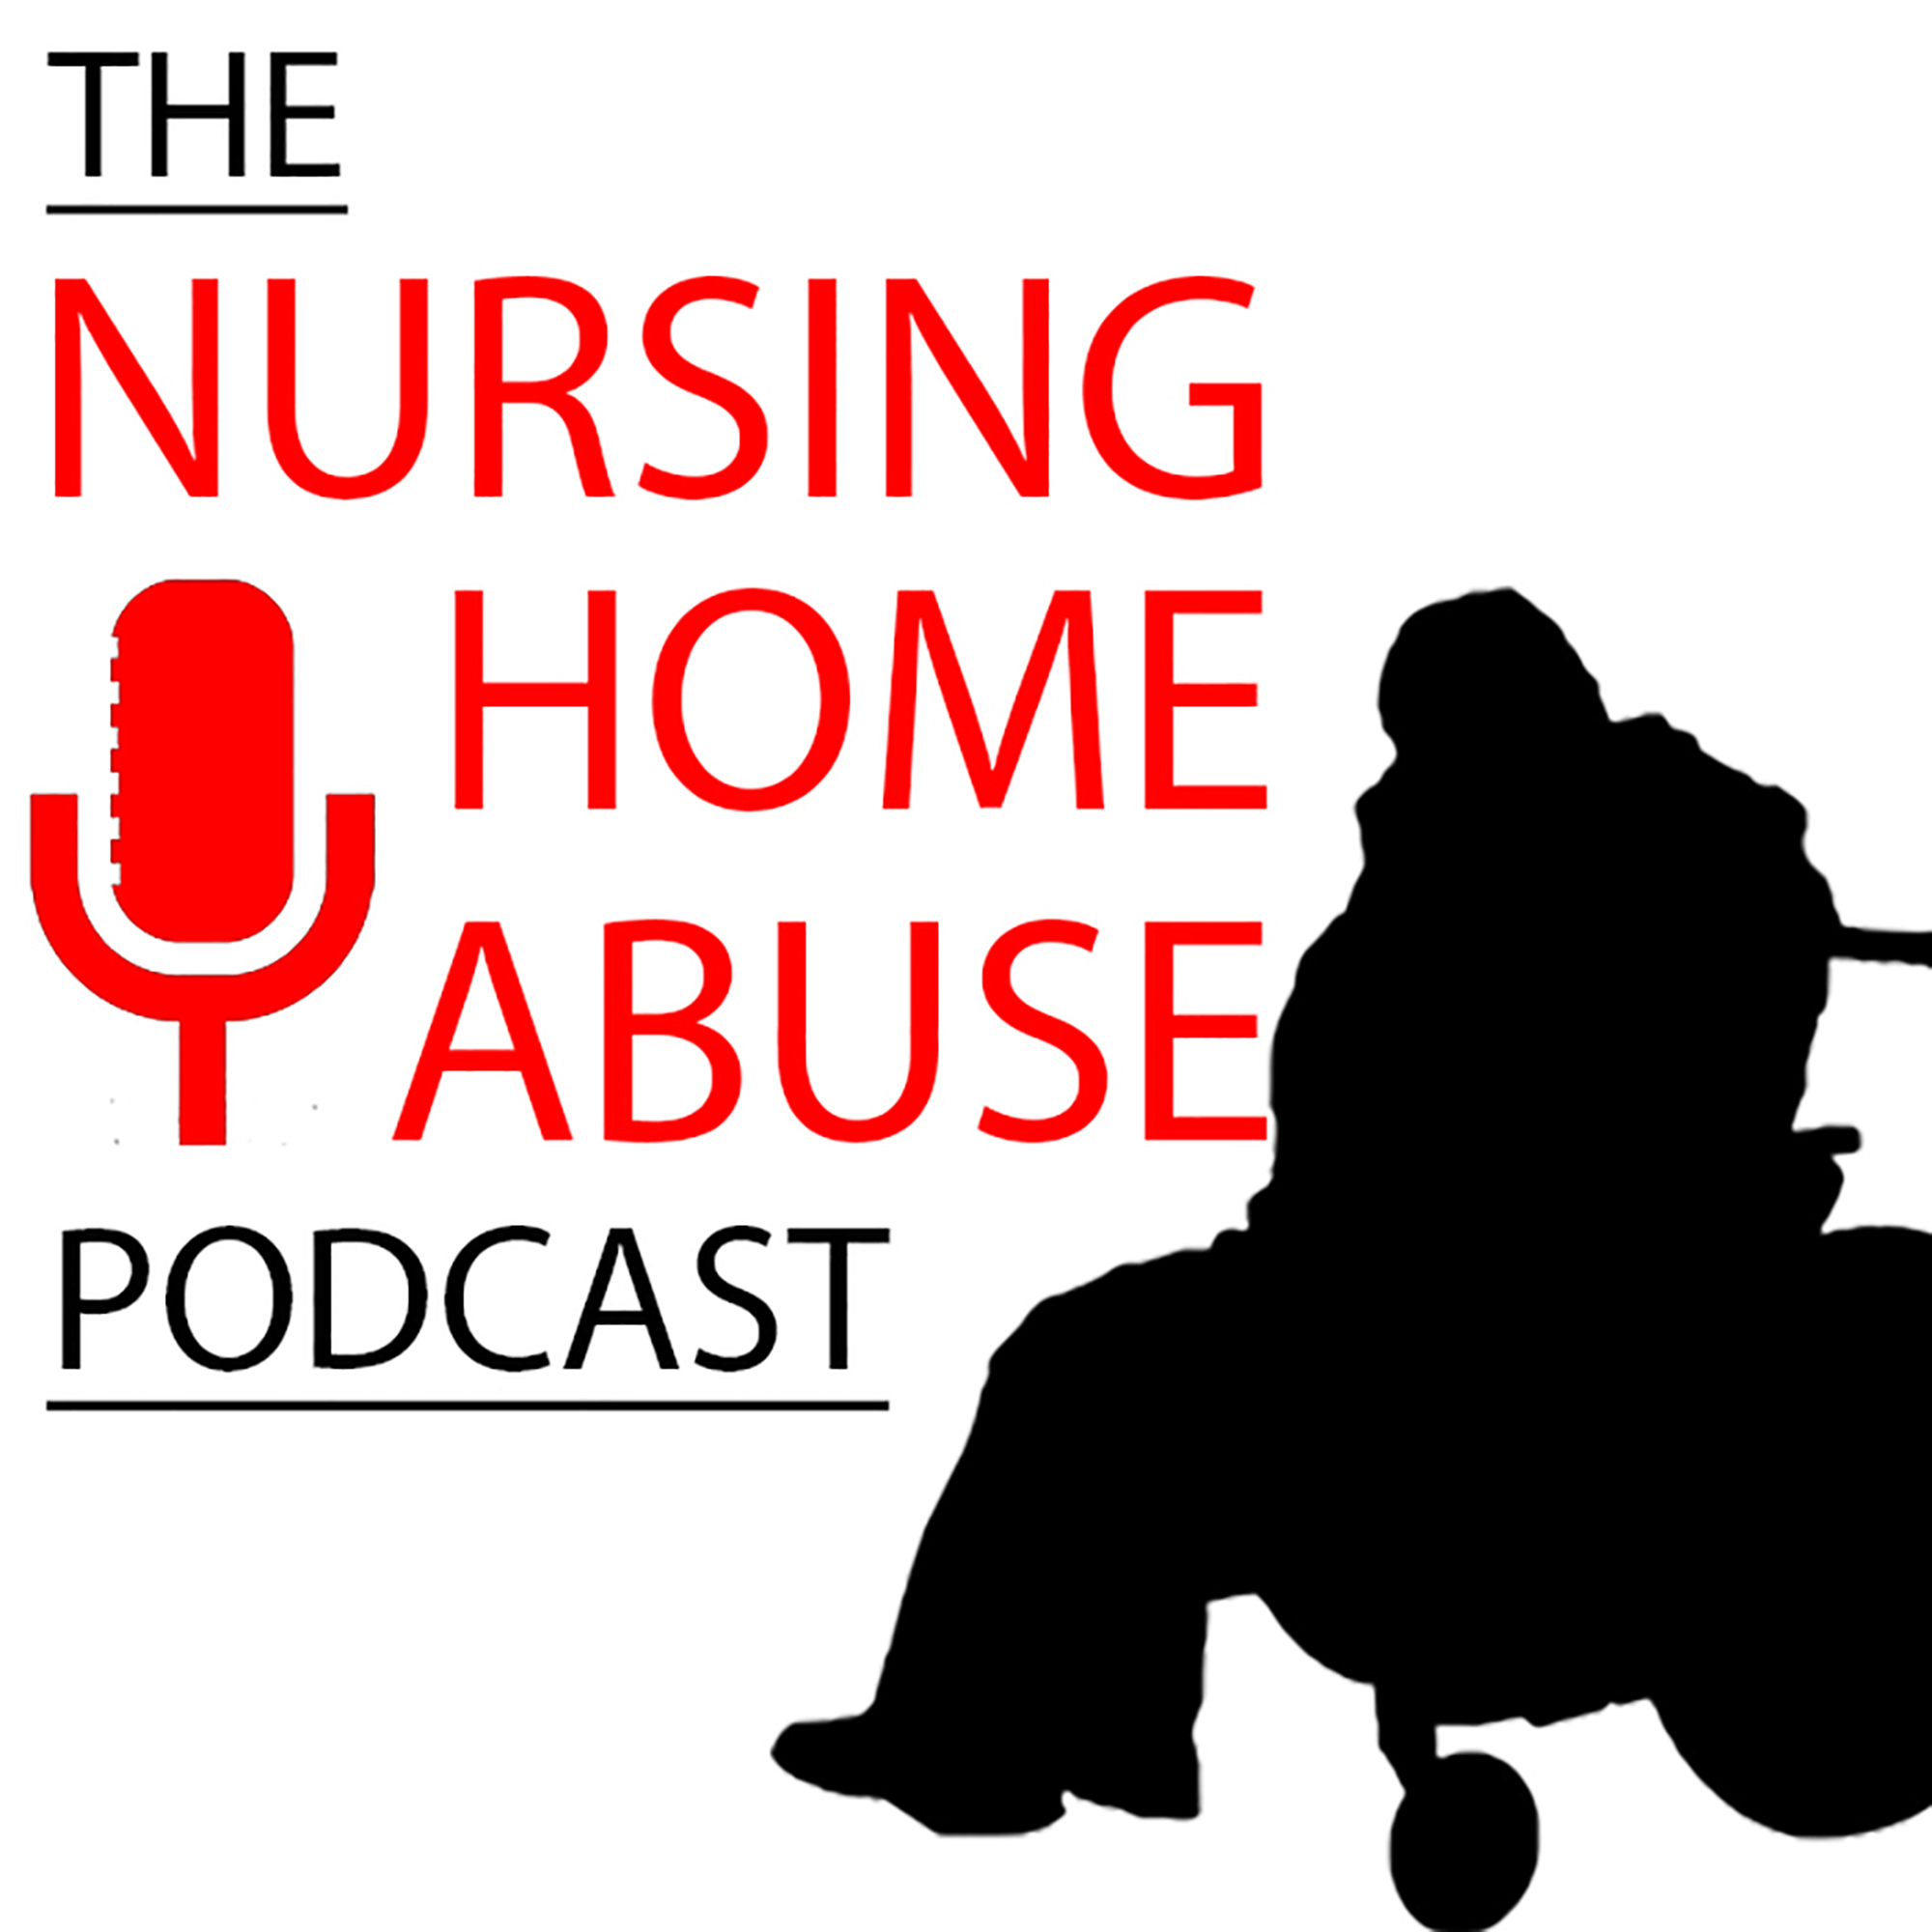 The Nursing Home Abuse Podcast show art